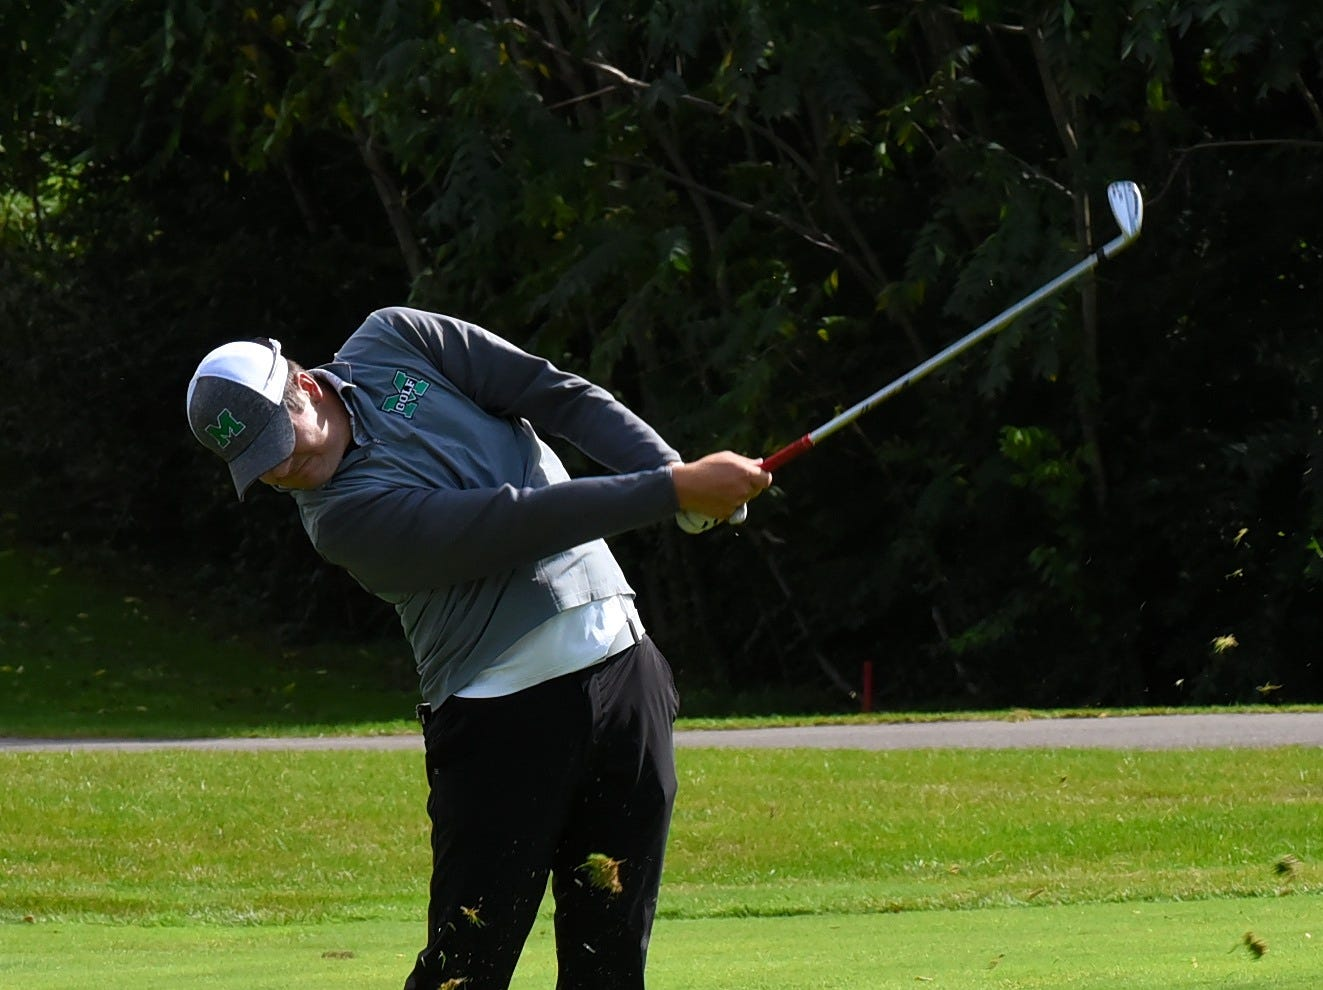 Matthew Scheid of Mason follows through on an approach shot at the 2018 Southwest District Golf Tournament in Beavercreek, Ohio, October 11, 2018.